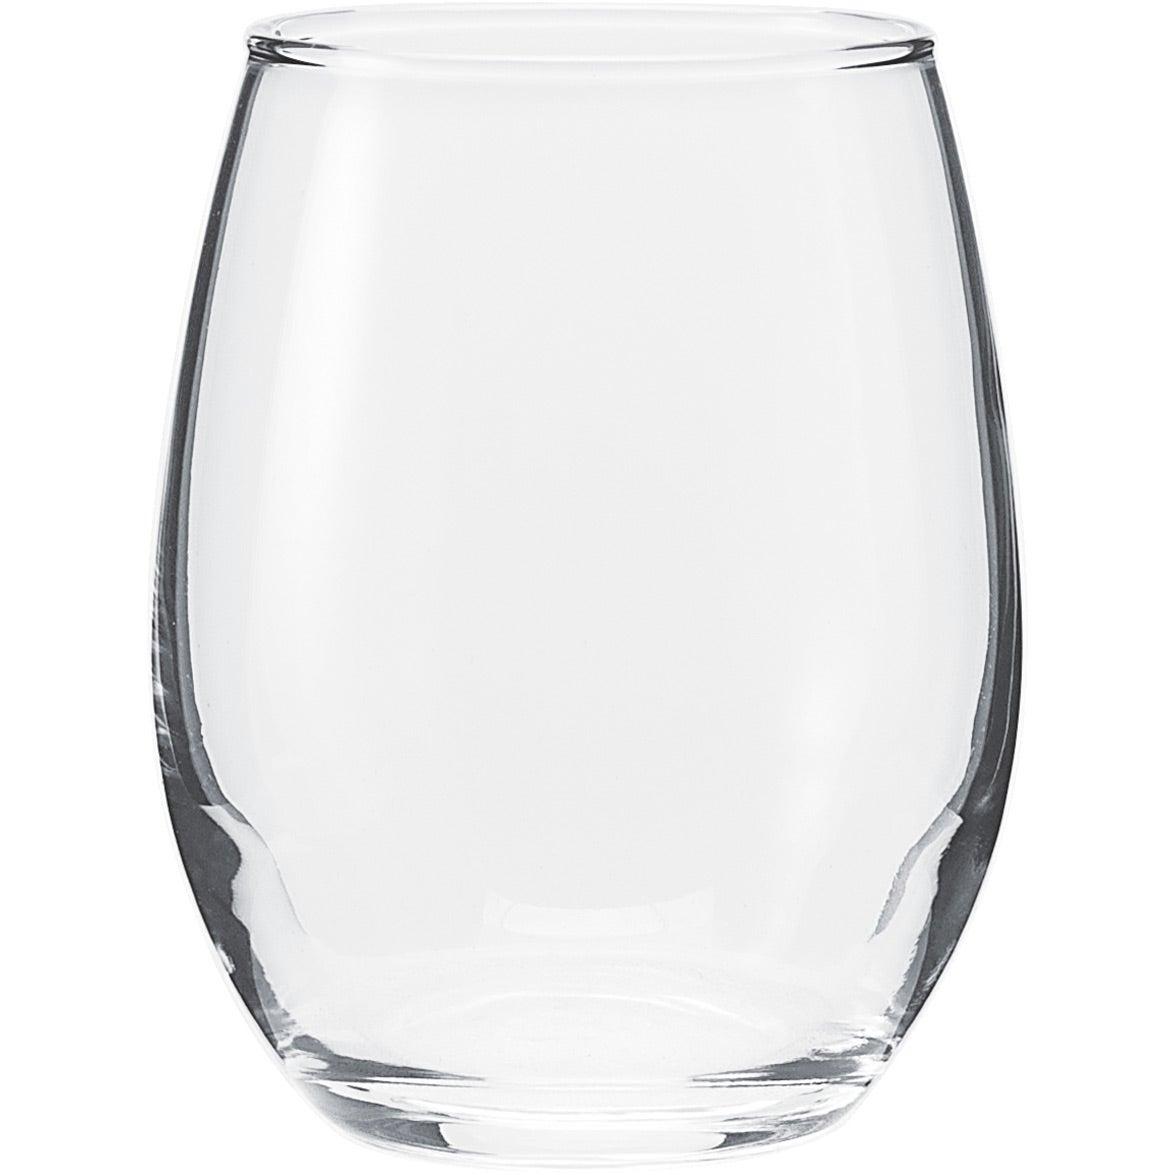 Stemless Wine Taster (9 Oz.)